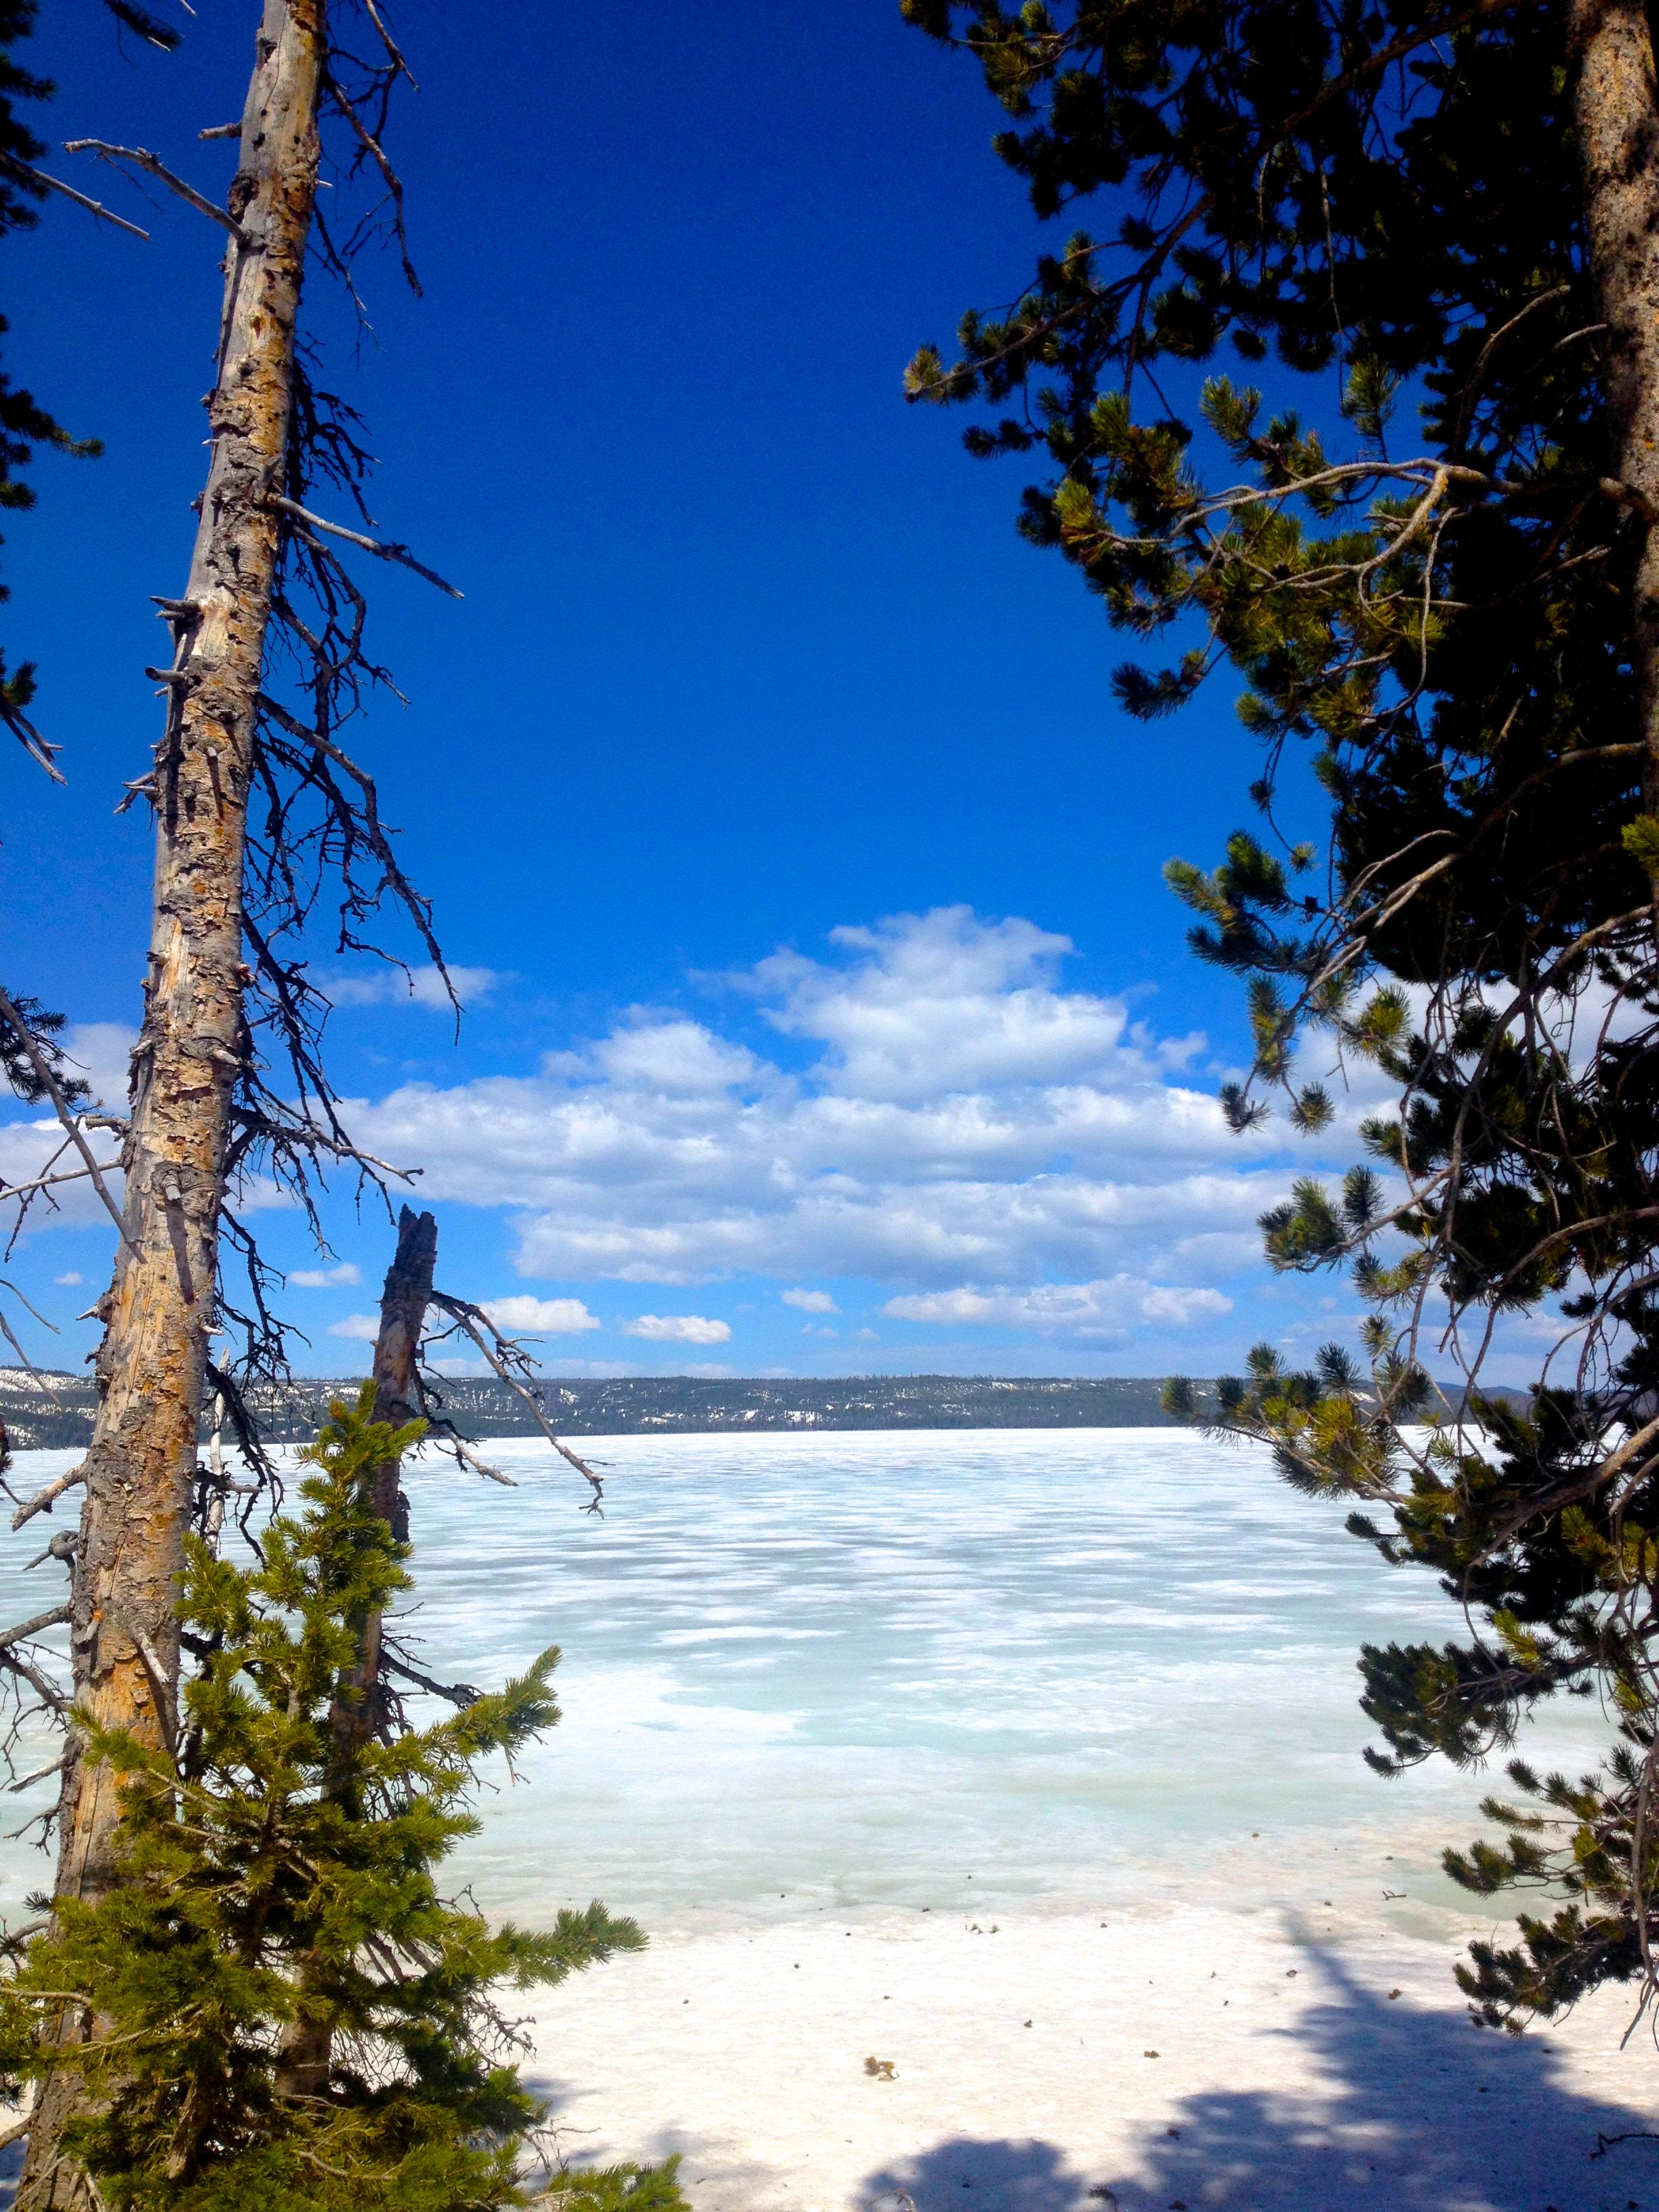 Lake Lewis, Yellowstone National Park